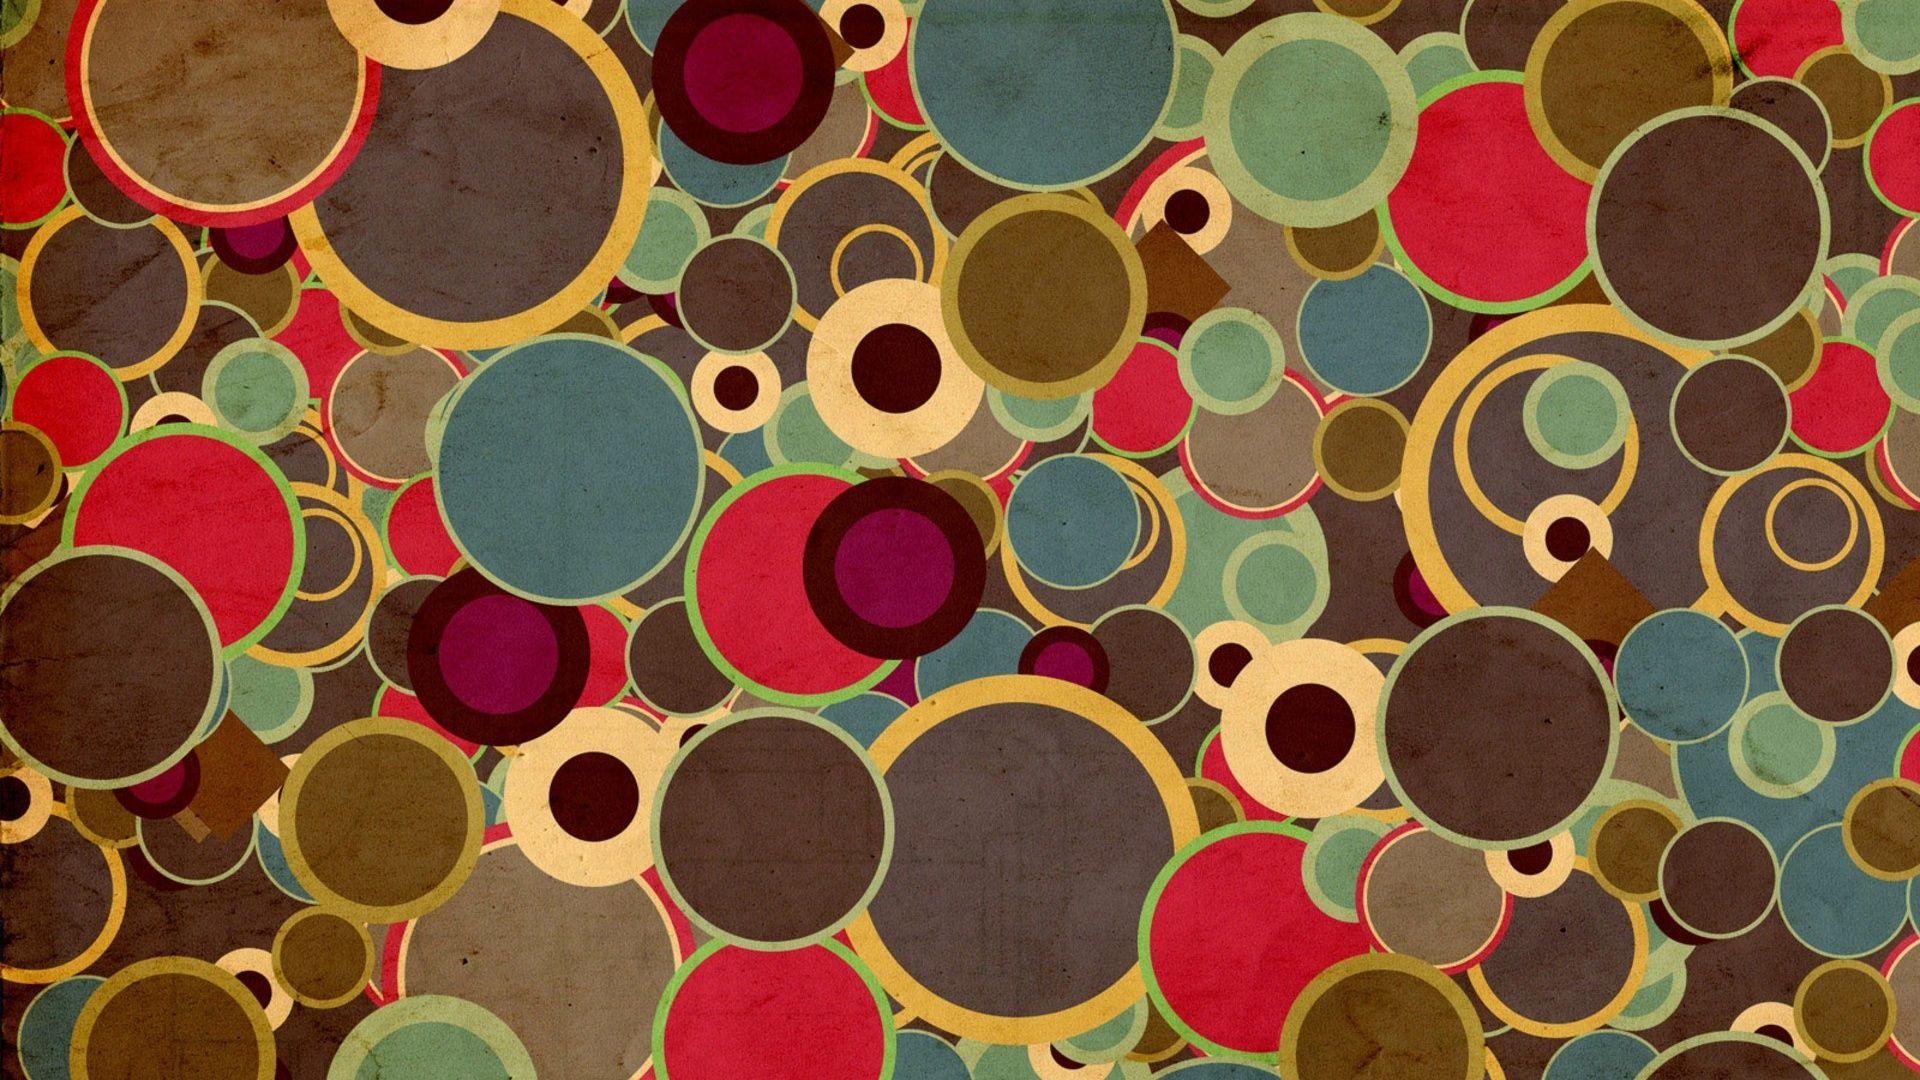 Circle desktop wallpaper